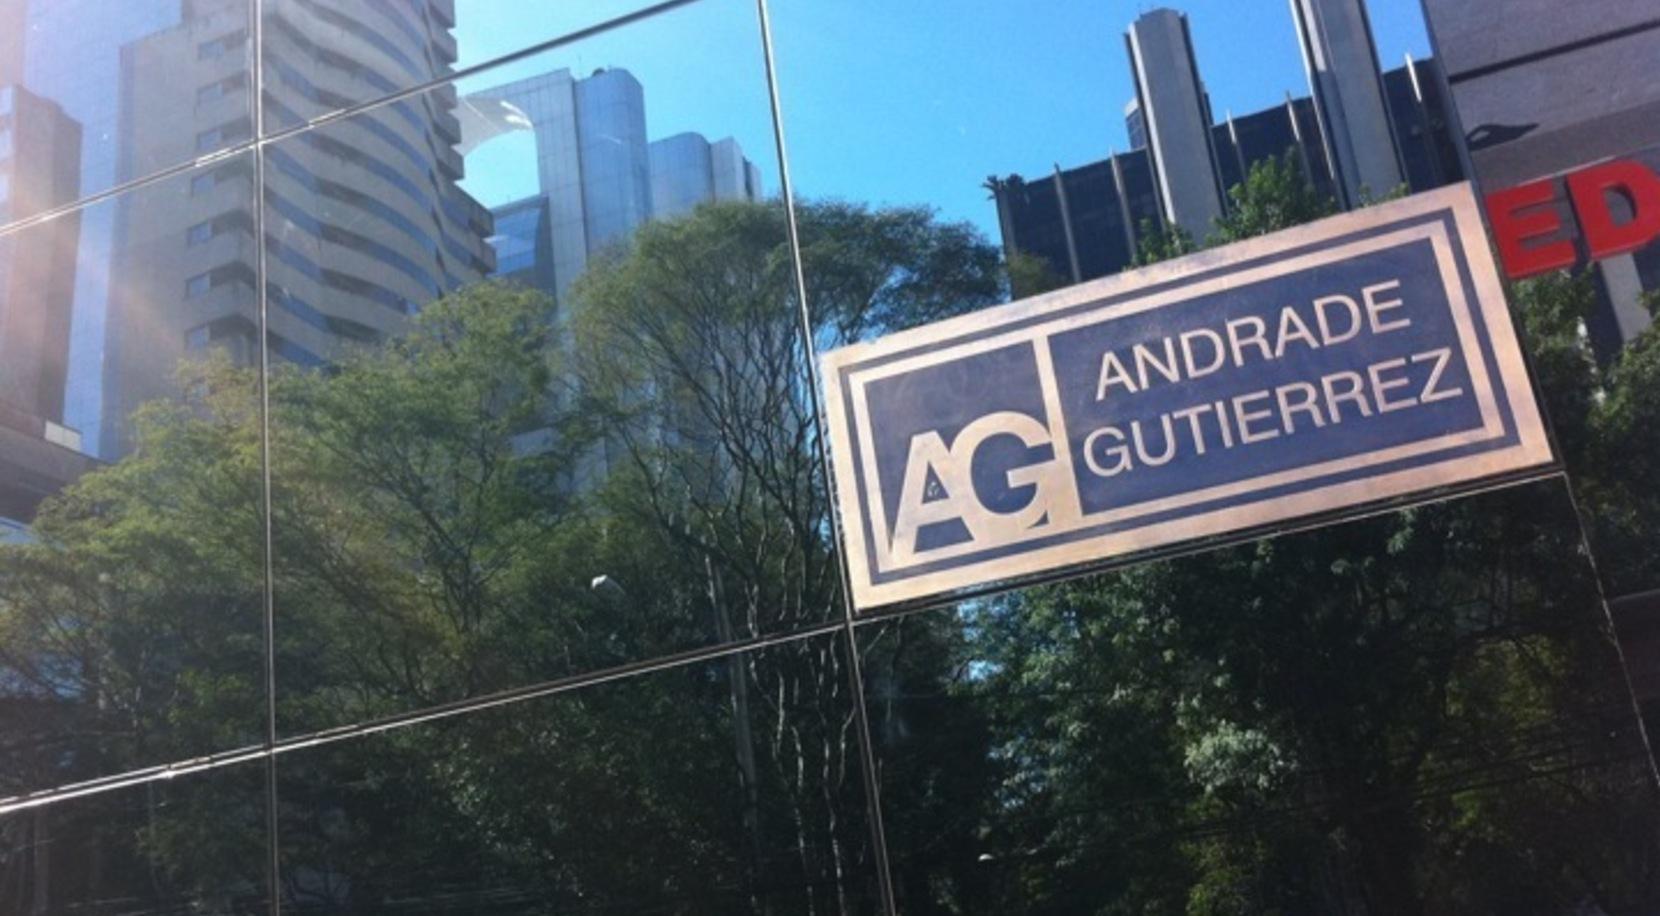 Leia na íntegra o pedido de desculpas da Andrade Gutierrez ao povo brasileiro